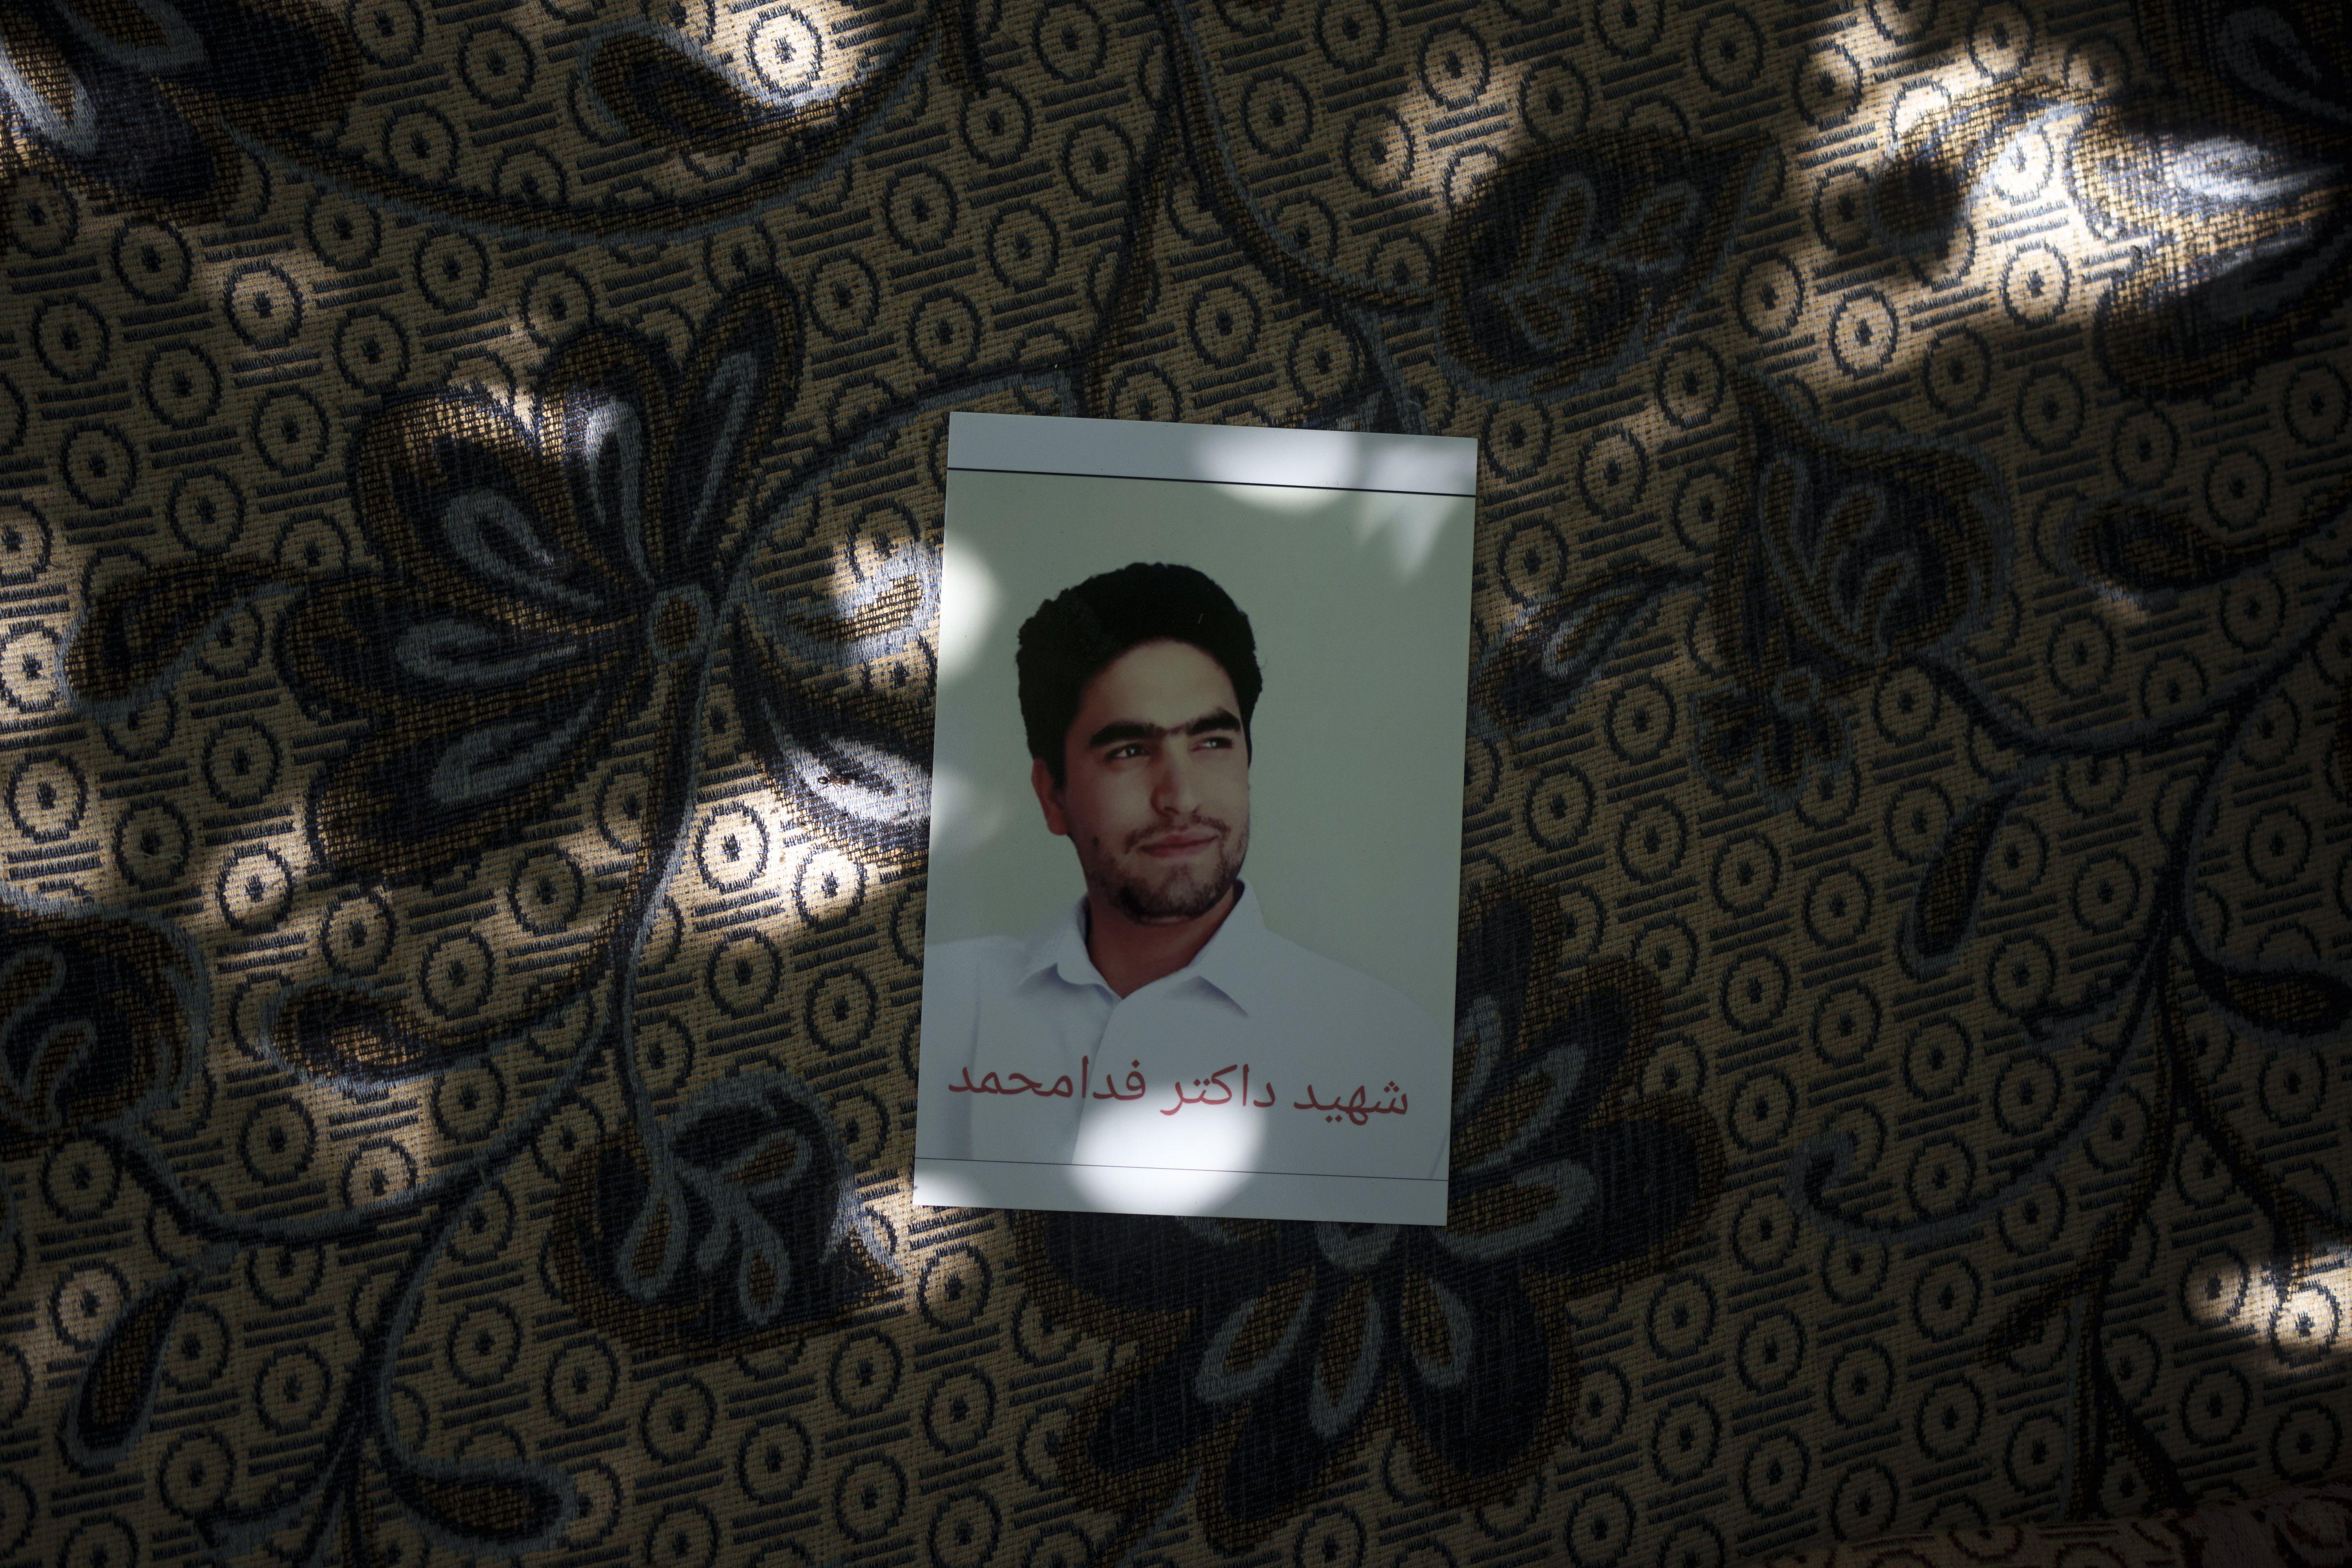 repercute muerte de afganos aferrados a avion de eeuu